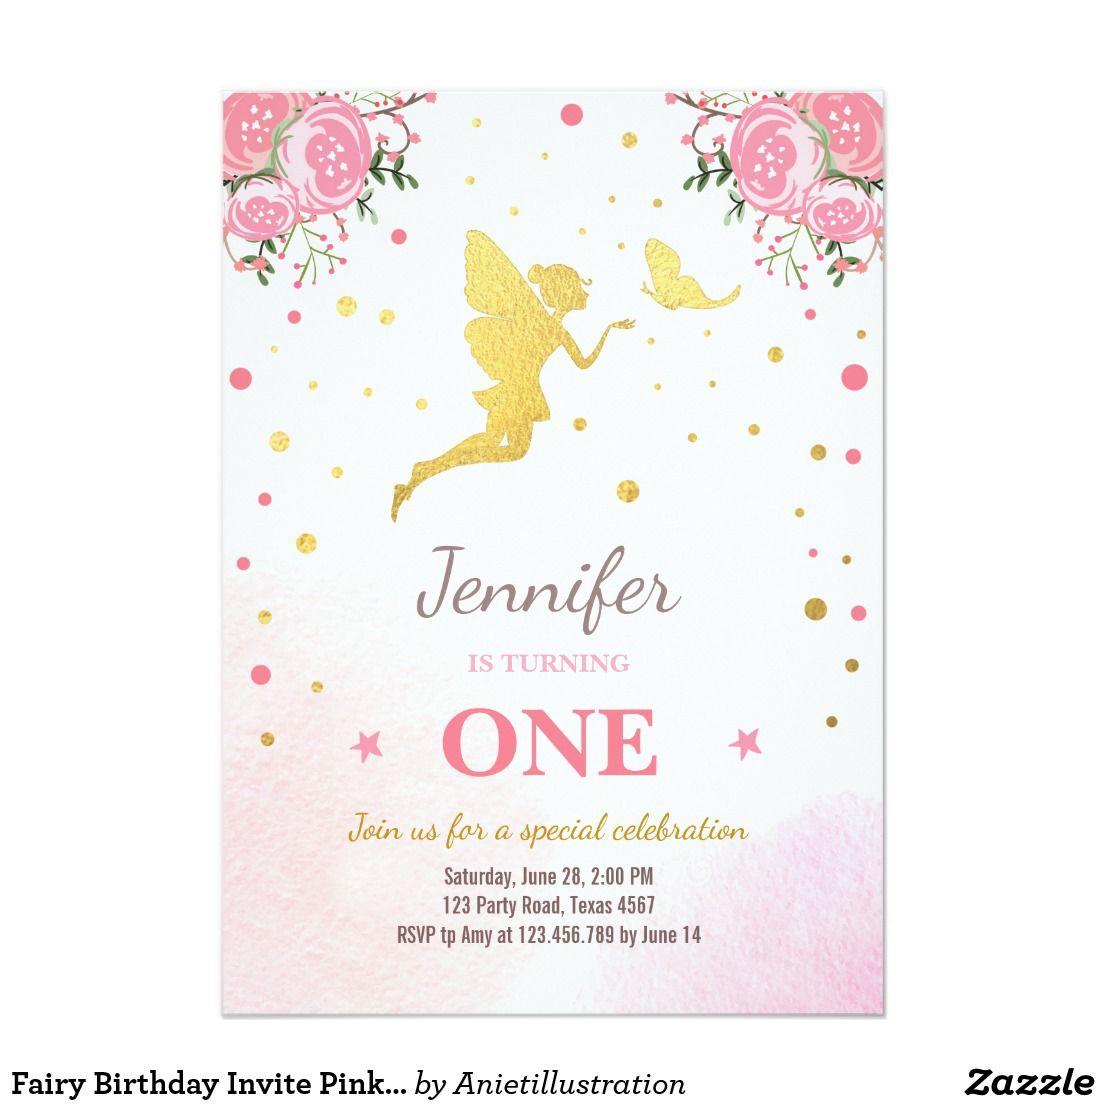 Fairy Birthday Invite Pink Gold Magical Whimsical | Fairy birthday